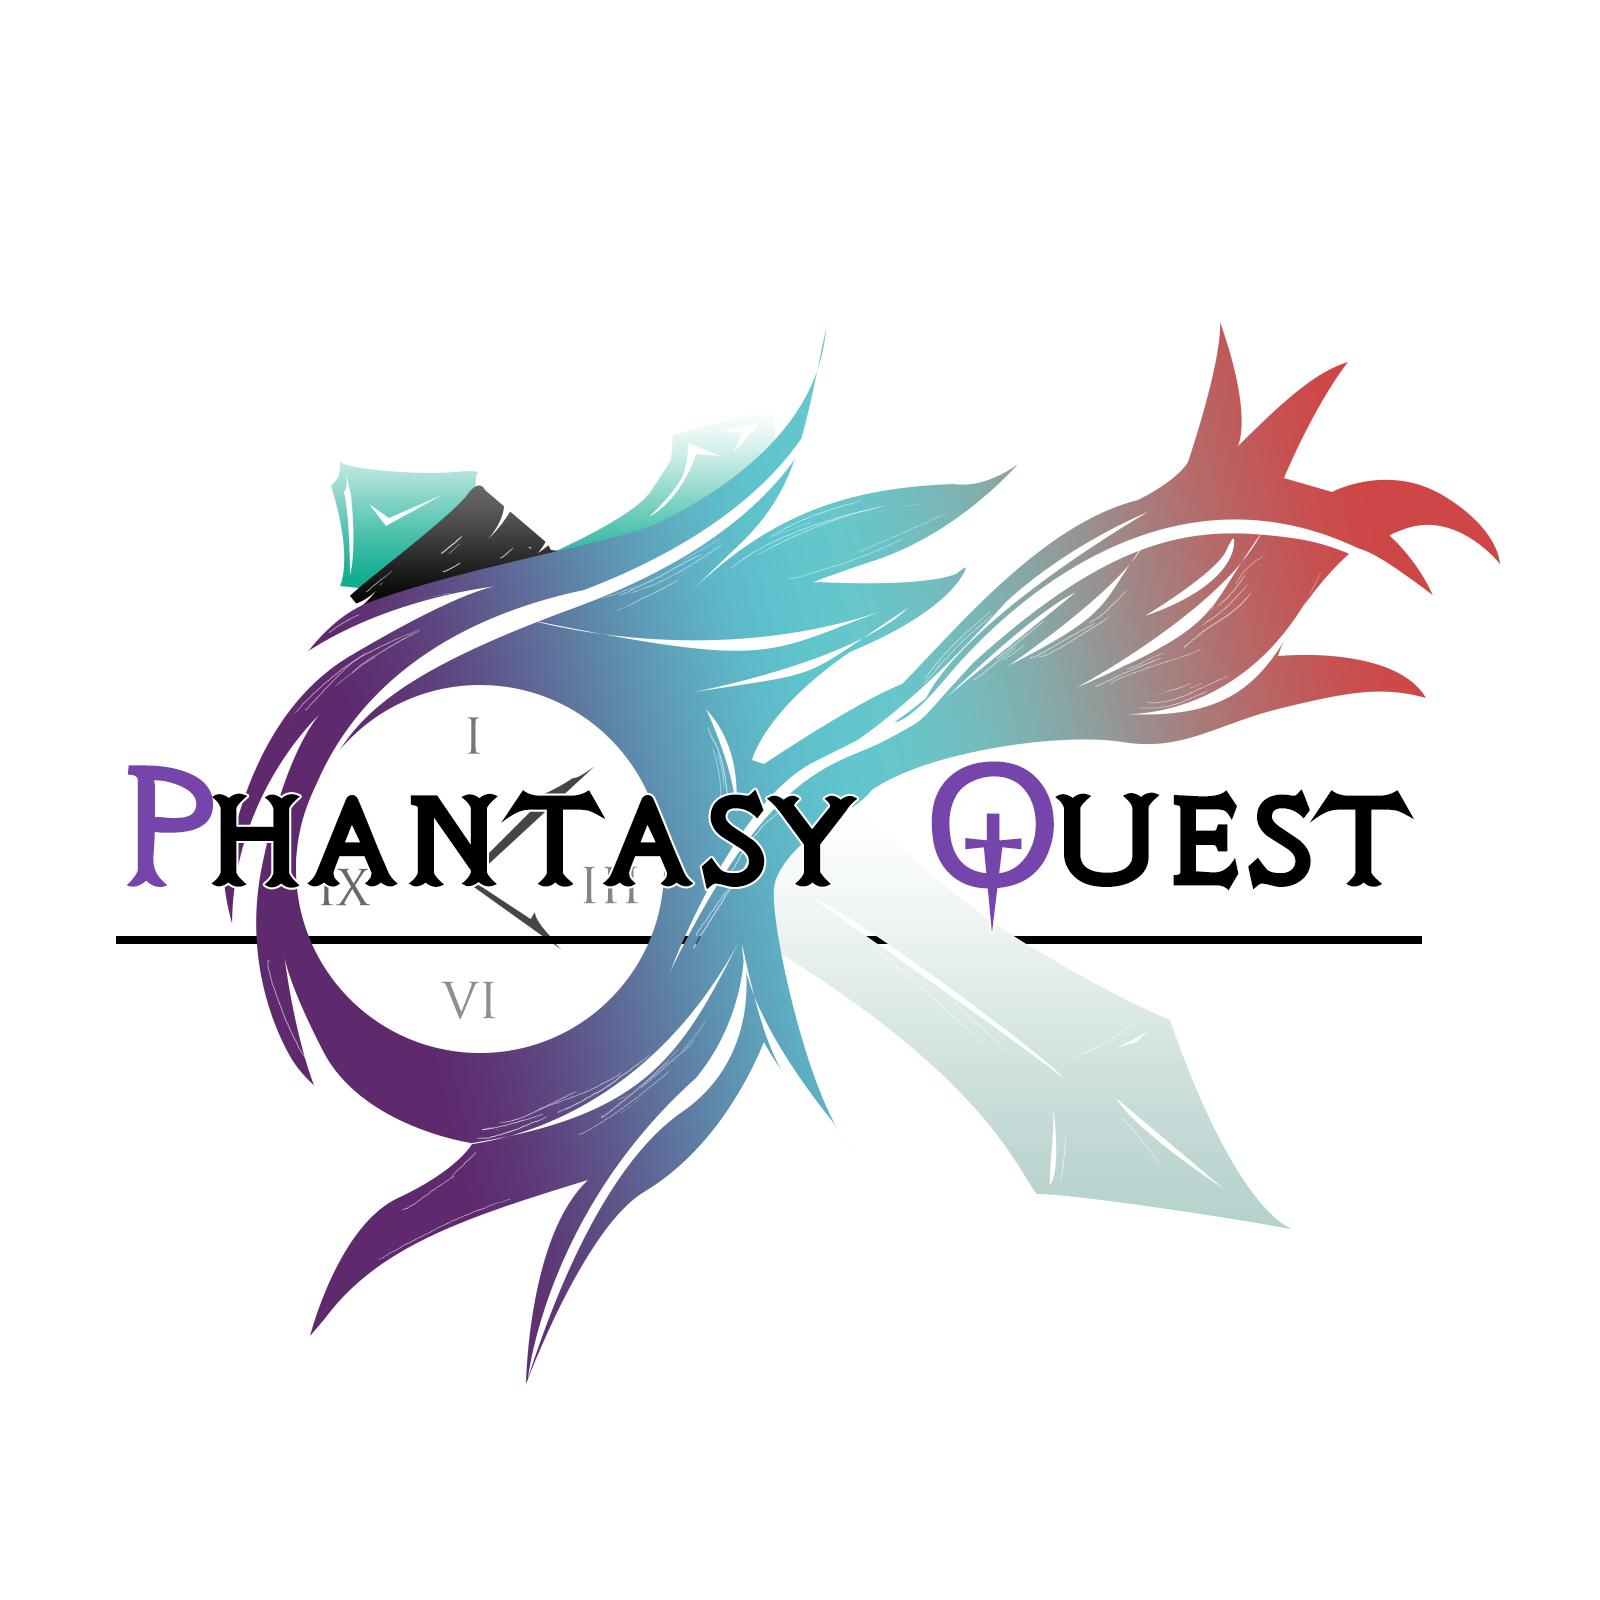 Phantasy Quest - Awakening